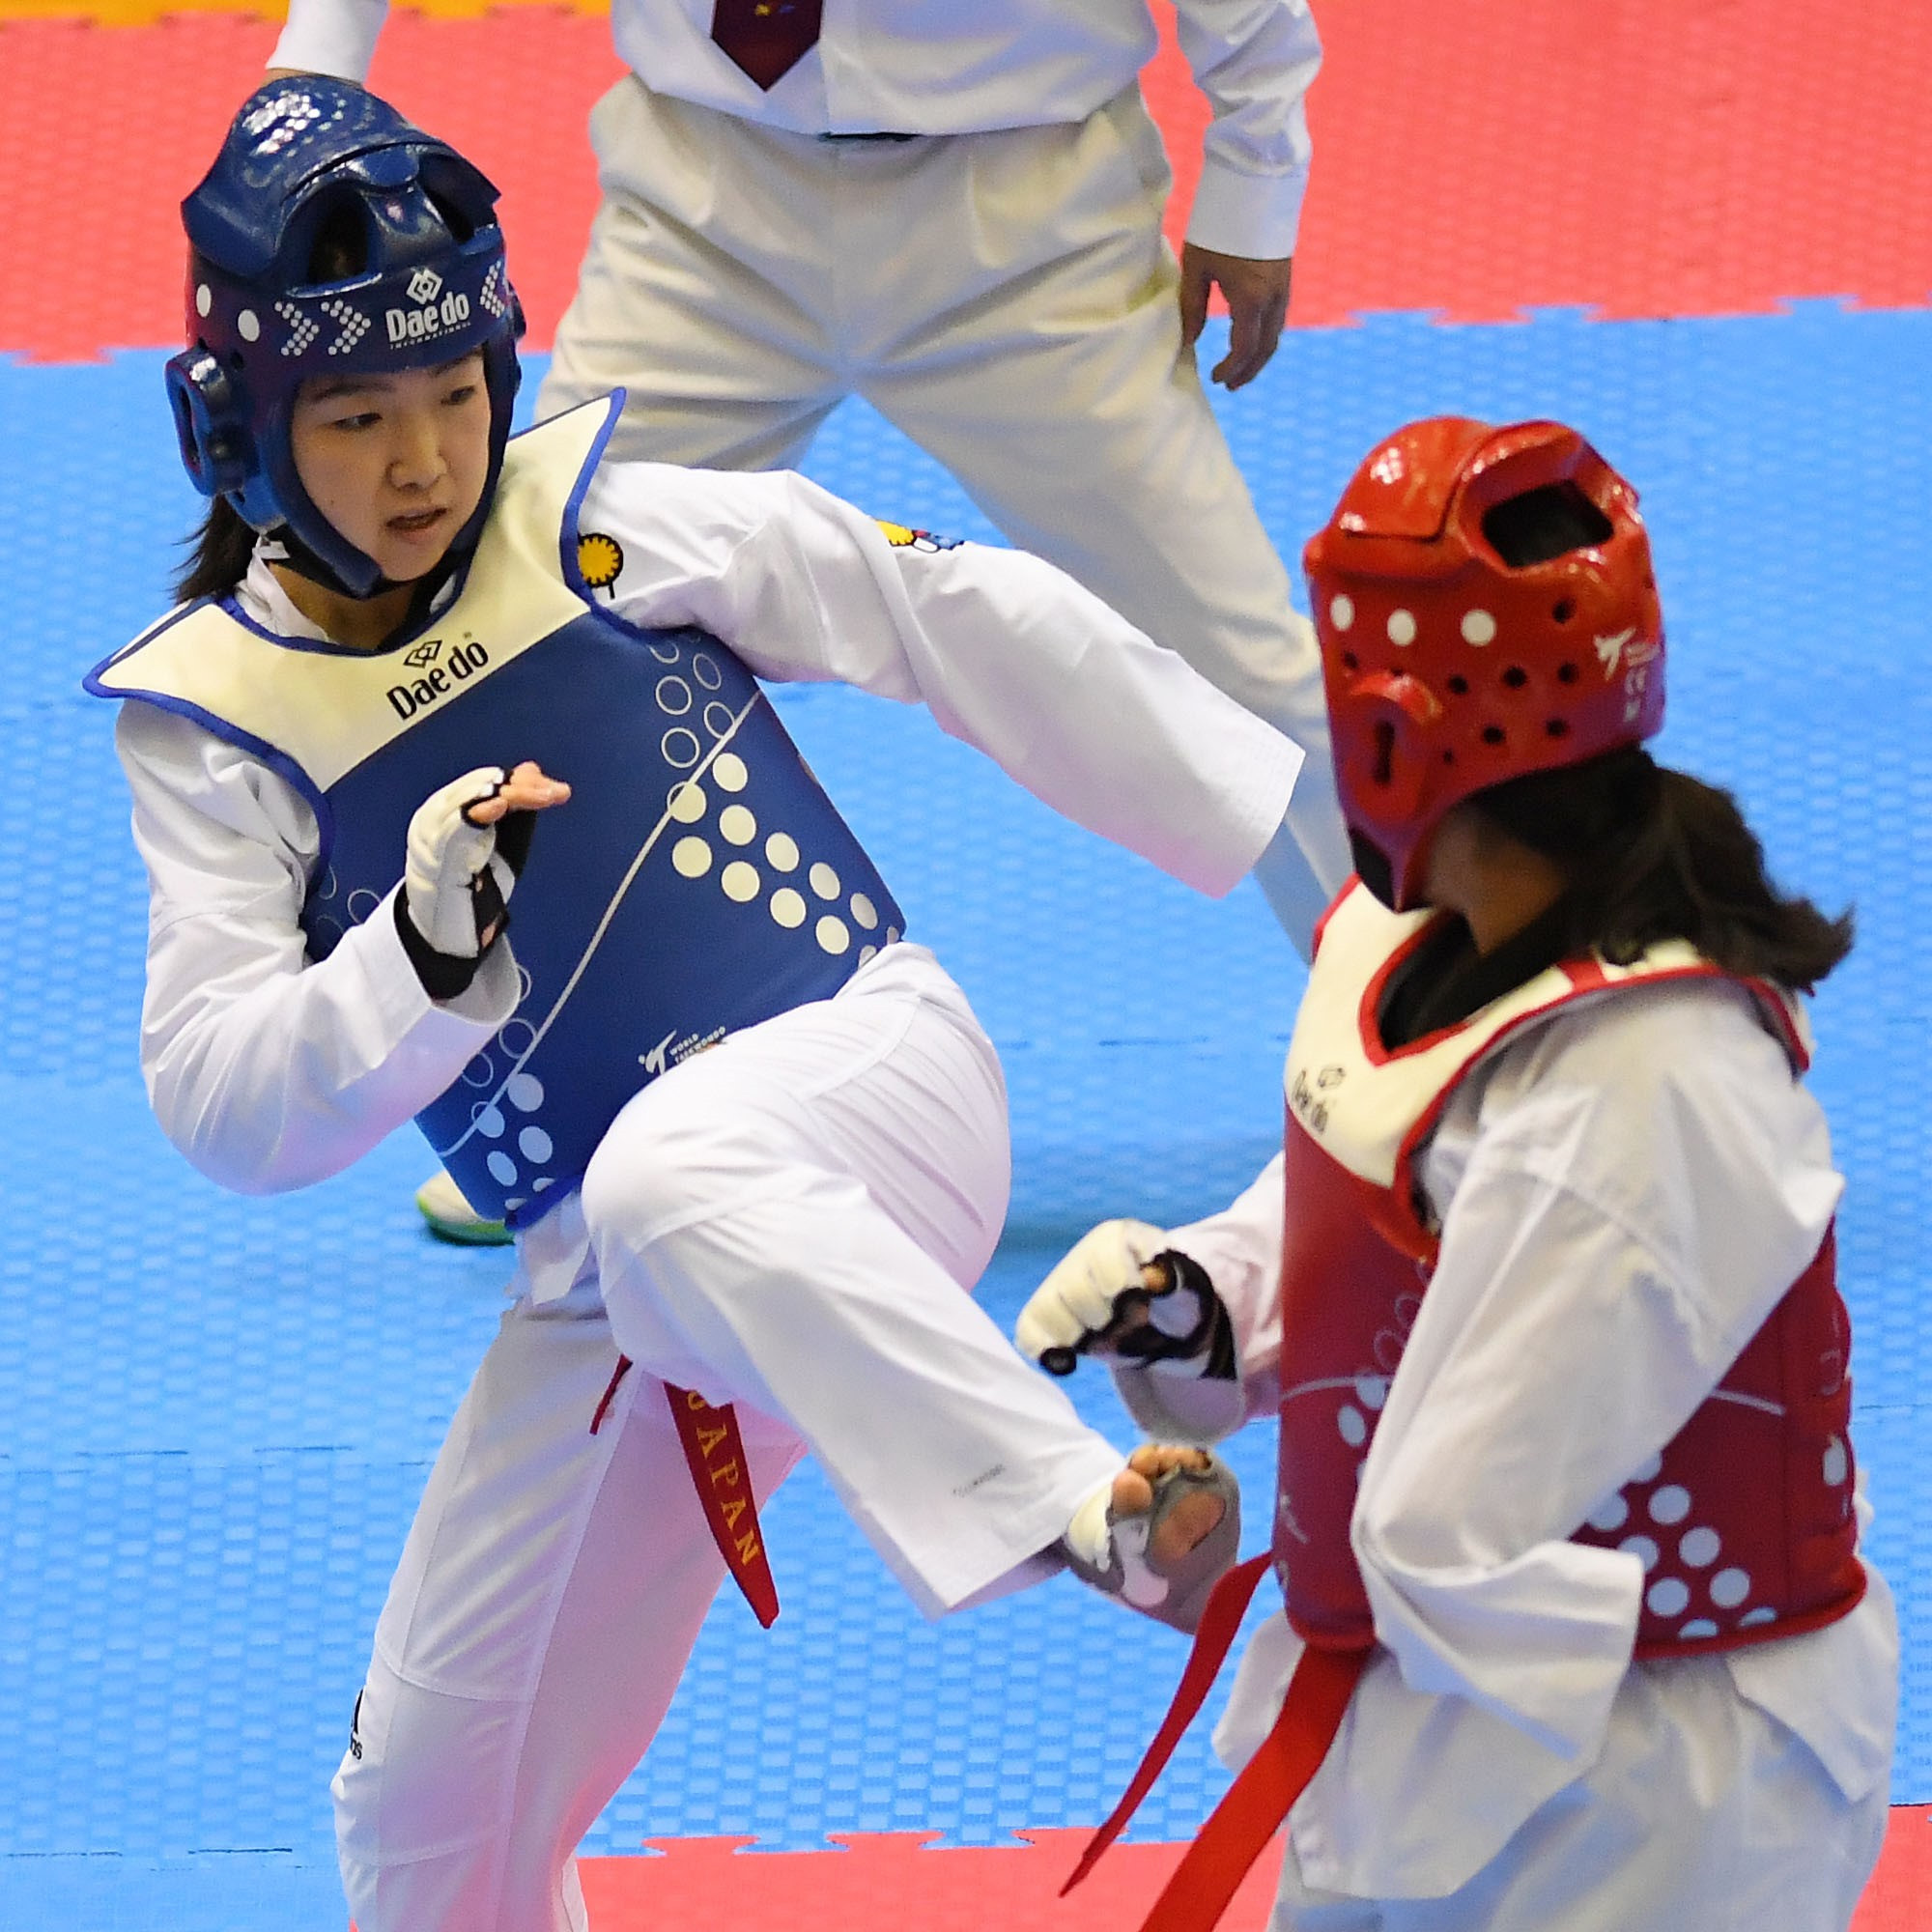 Shoko Ota has swapped skis for the taekwondo mat ©Getty Images